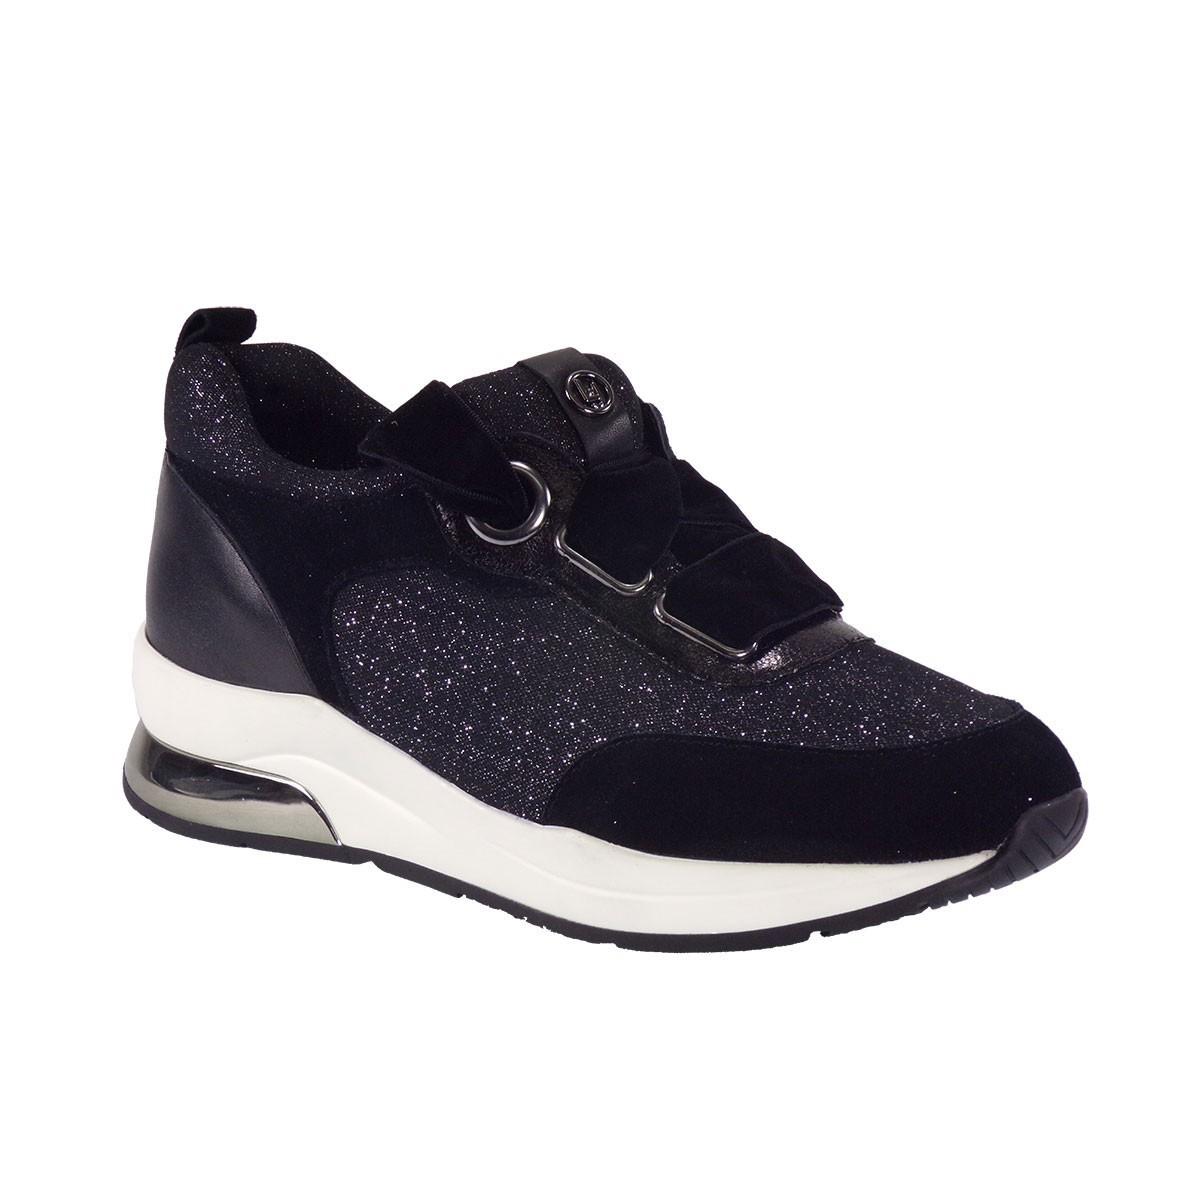 Liu-Jo Sneakers KARLIE 06 Παπούτσια Γυναικεία B68005 Μαύρο 010039